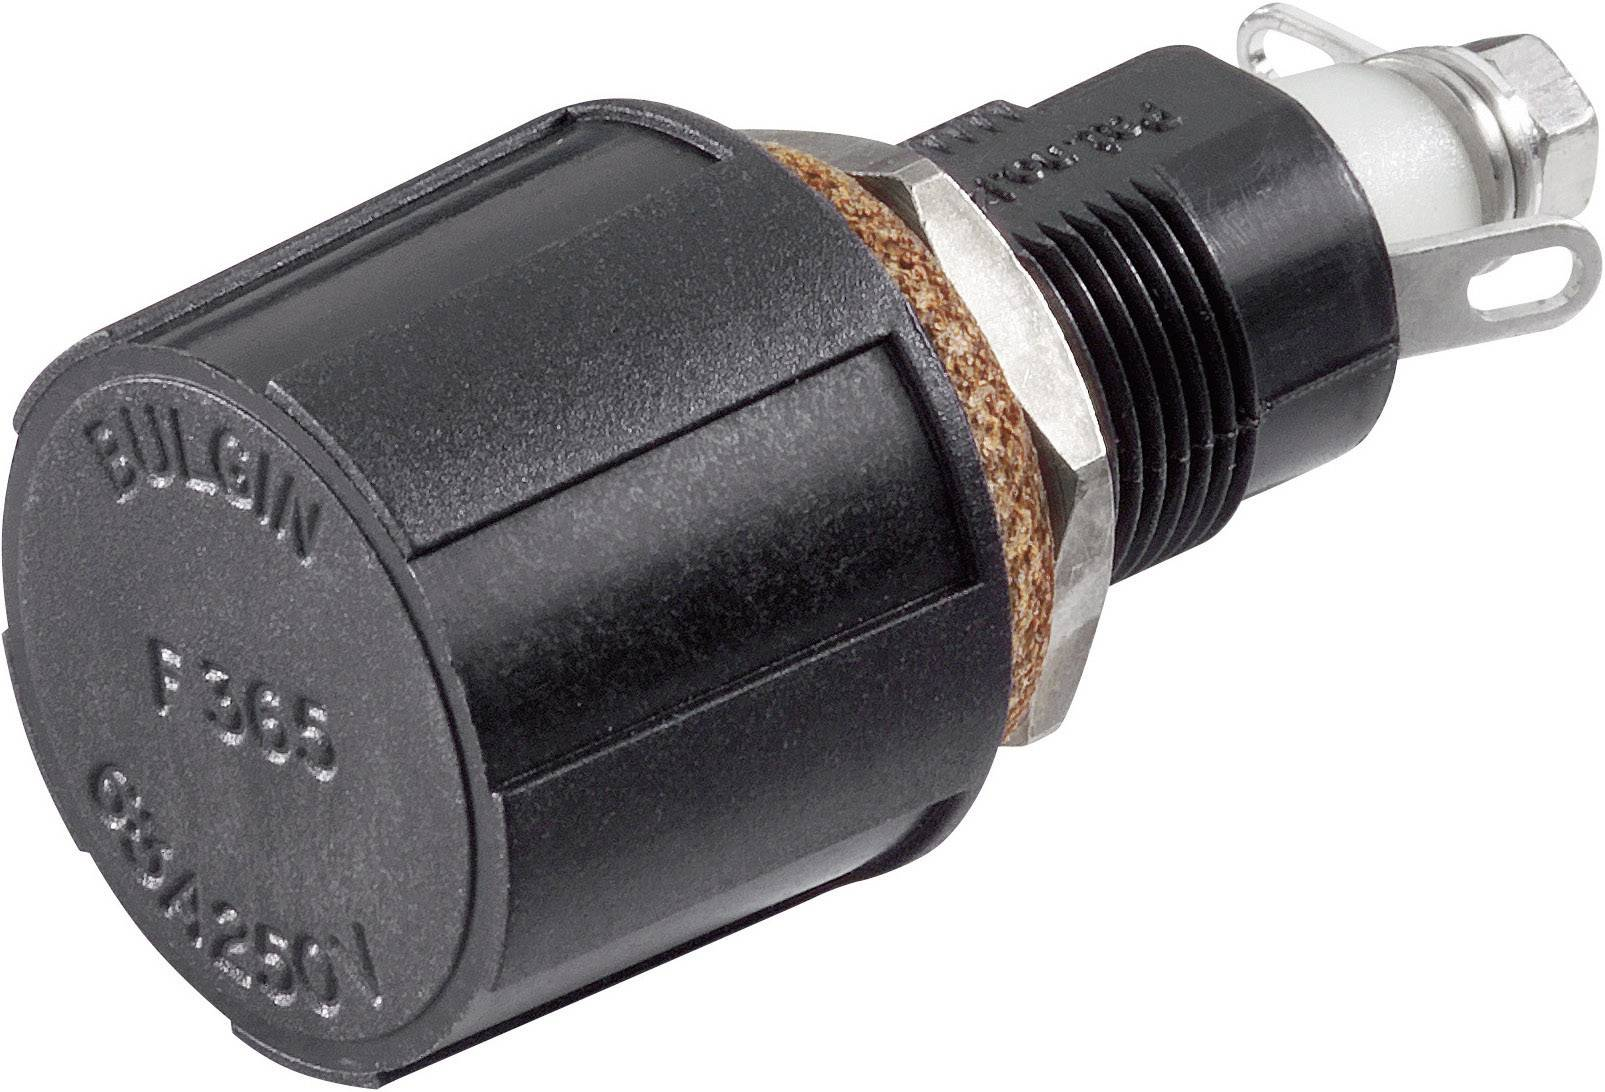 Držák pojistky ESKA Bulgin FX0365, 5 x 20 mm, 250 V/AC, 6,3 A